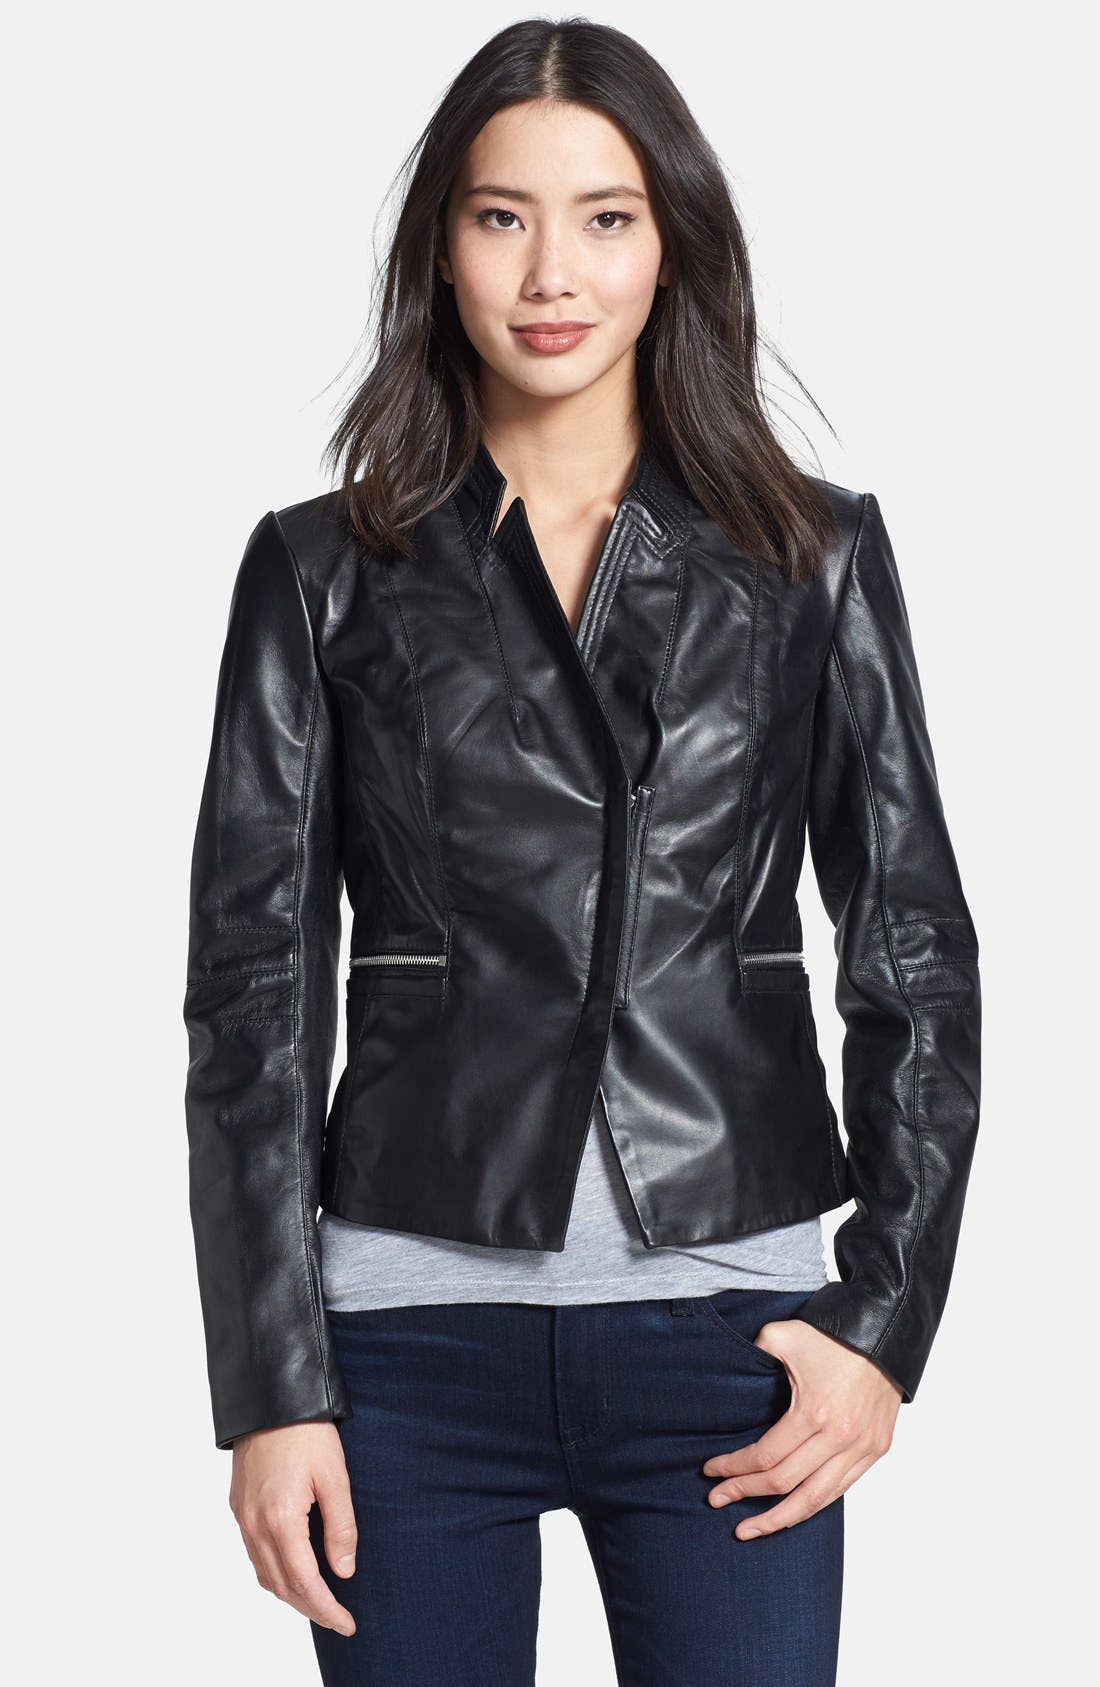 Alternate Image 1 Selected - Laundry by Shelli Segal Peplum Back Cutaway Leather Jacket